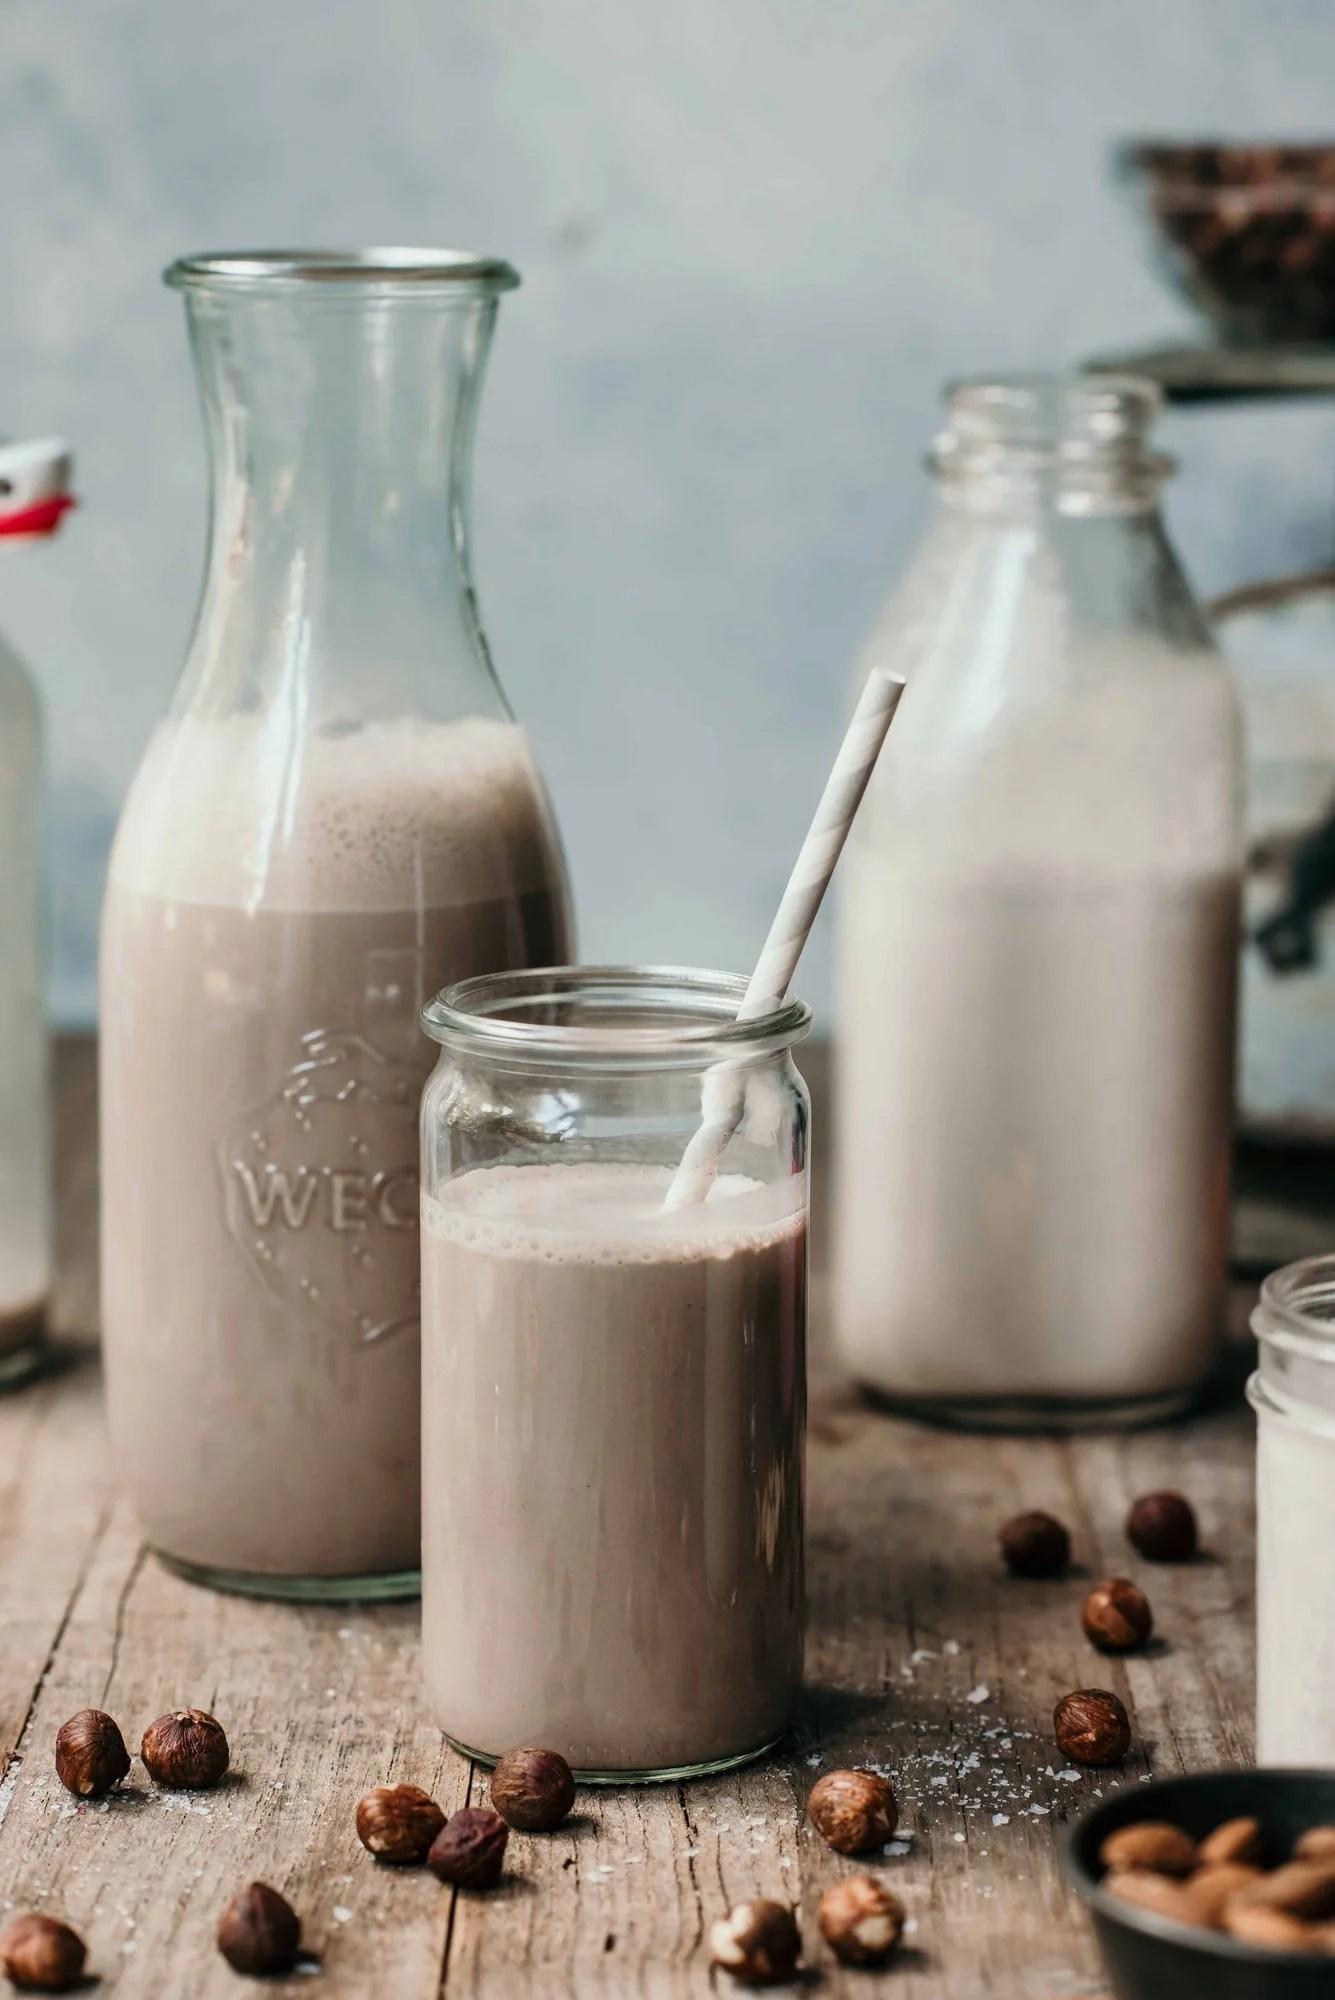 Homemade chocolate hazelnut milk in glass jars